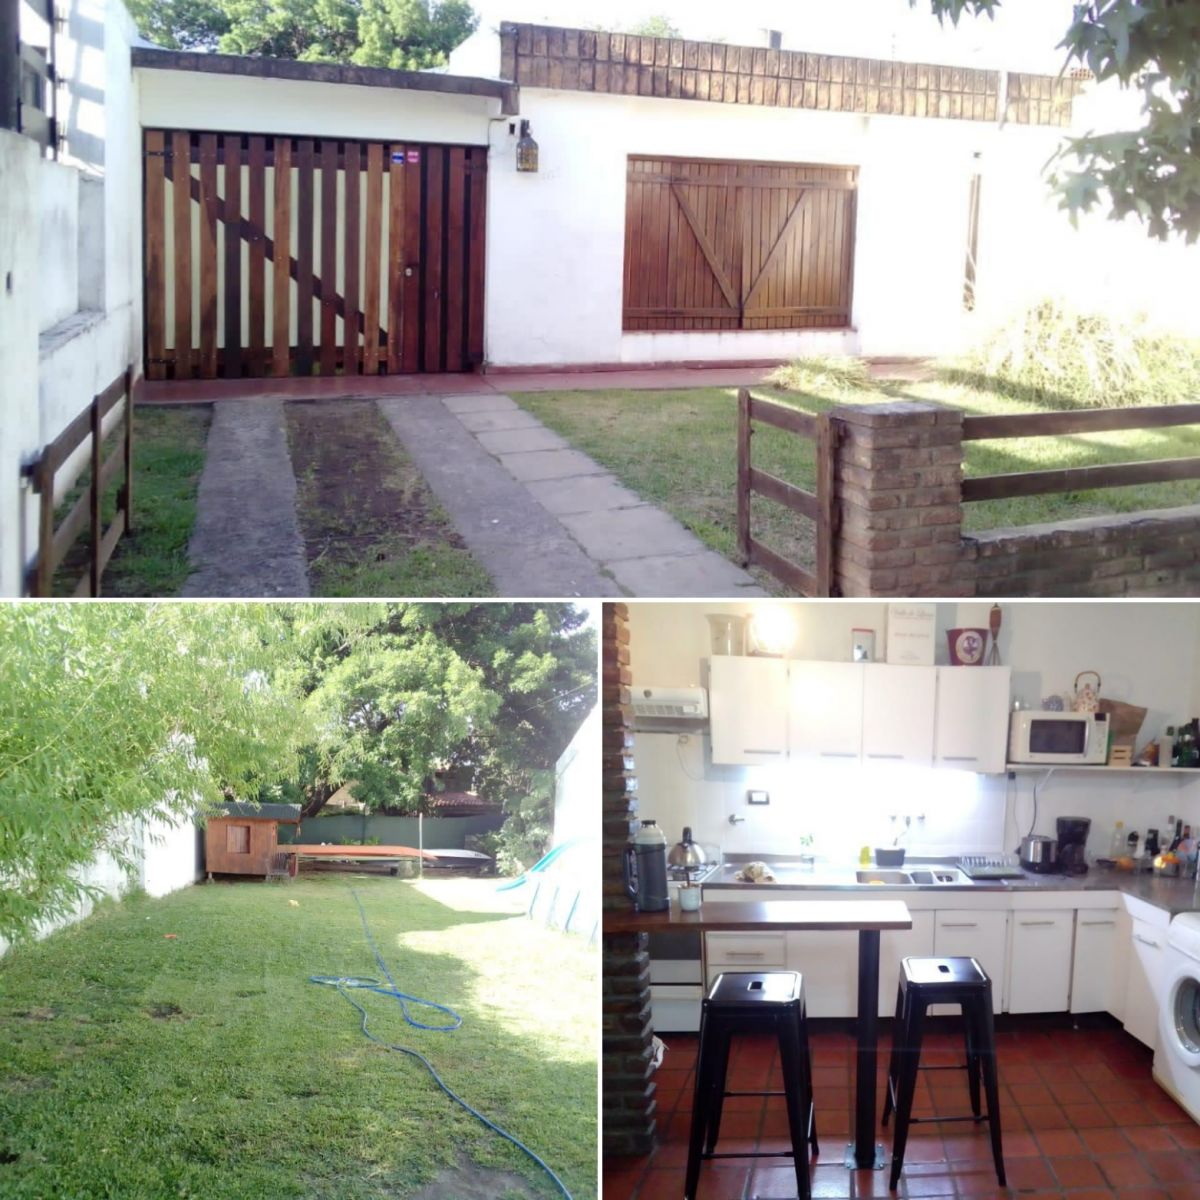 Salvat 1700: barrio Lomas de Alberdi